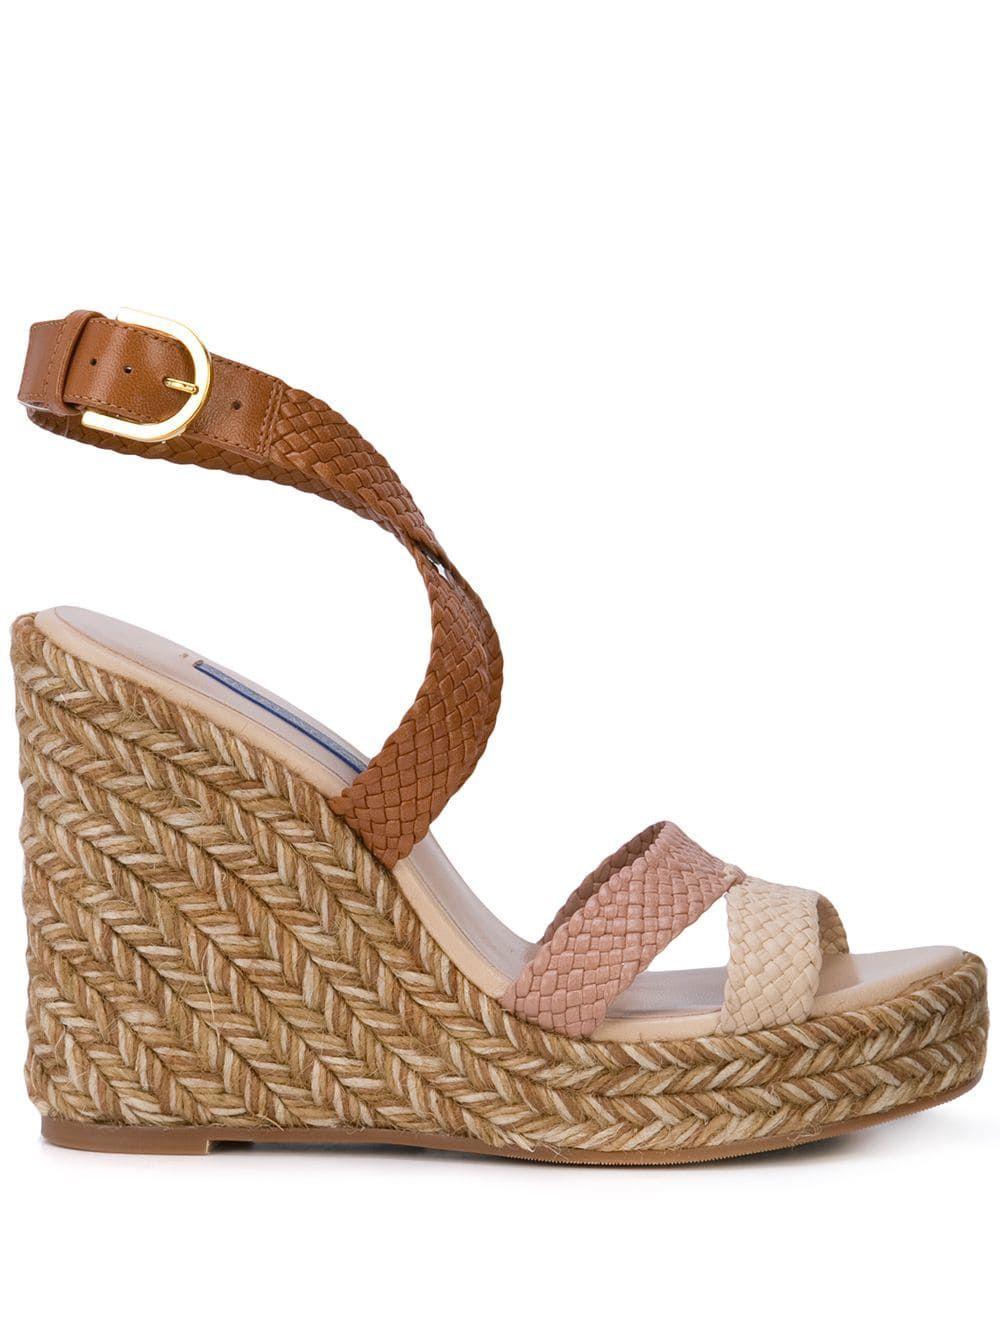 50774dc5c03 Stuart Weitzman Elsie wedge sandals - Brown in 2019   Products ...